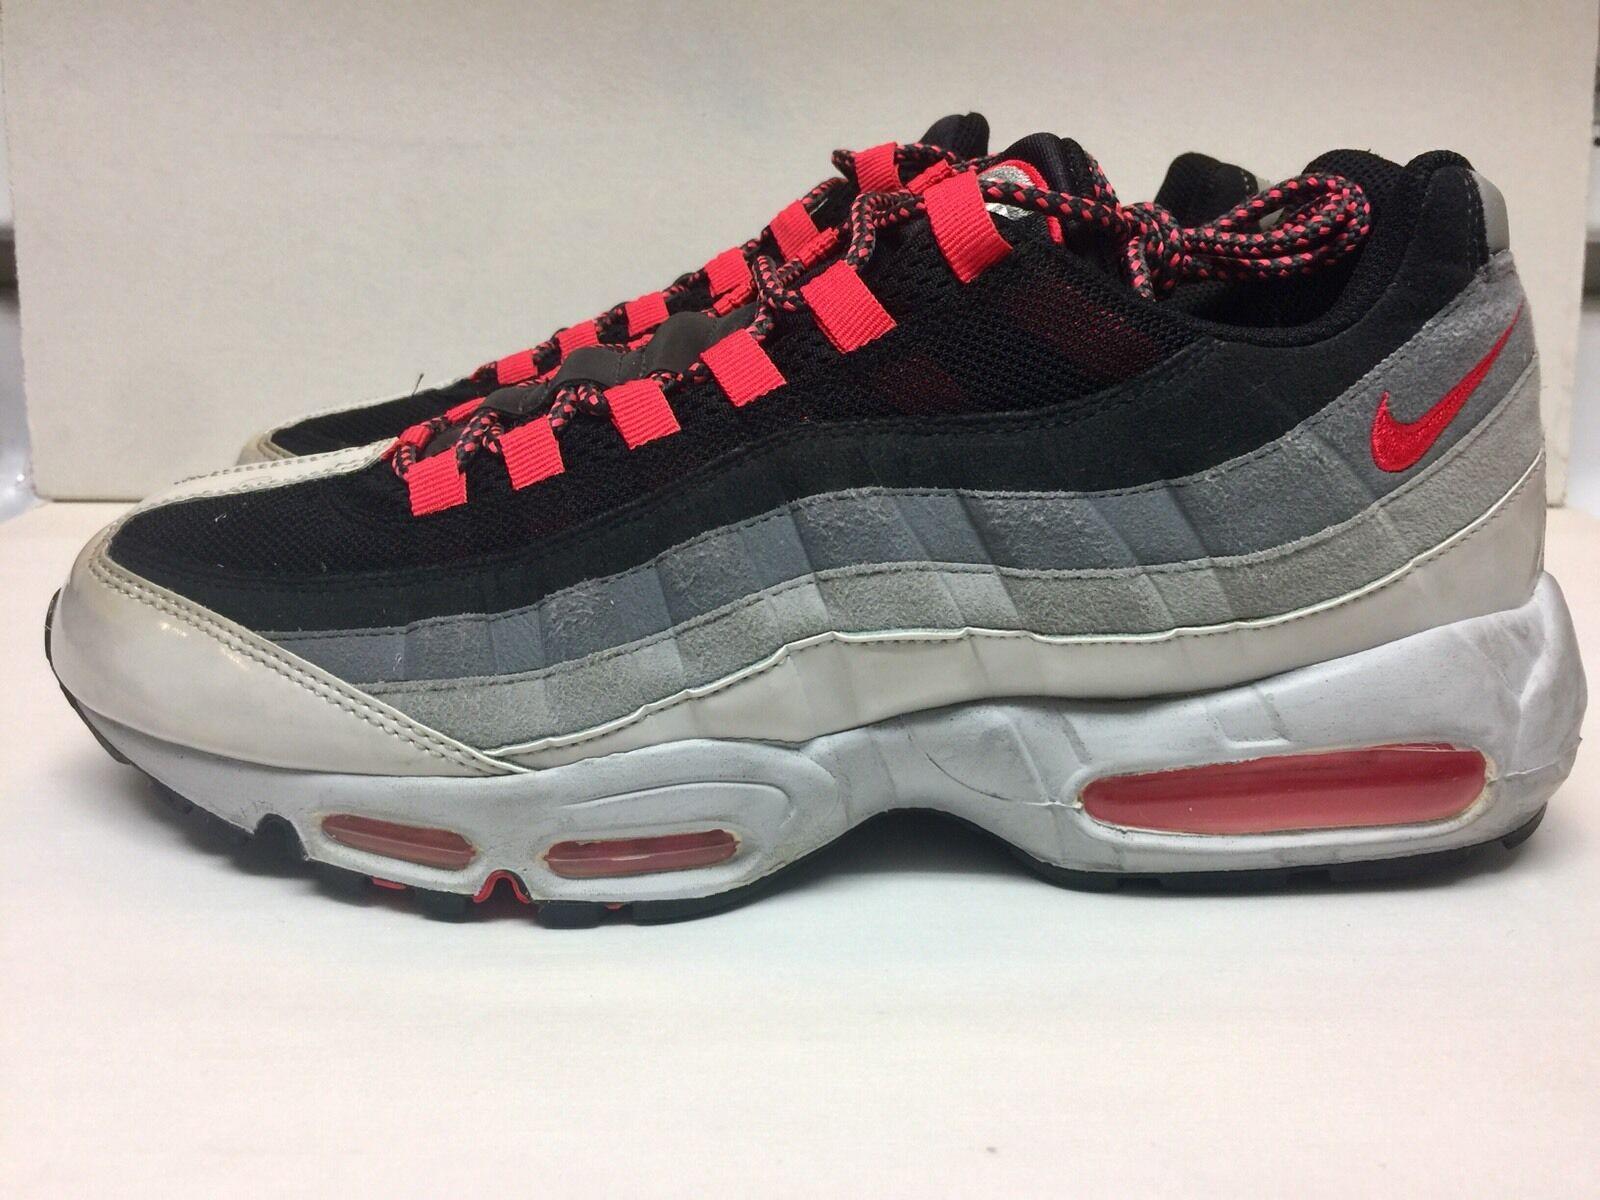 Nike air max 95 rari nero rosse neutrale gray sz (609048-065)